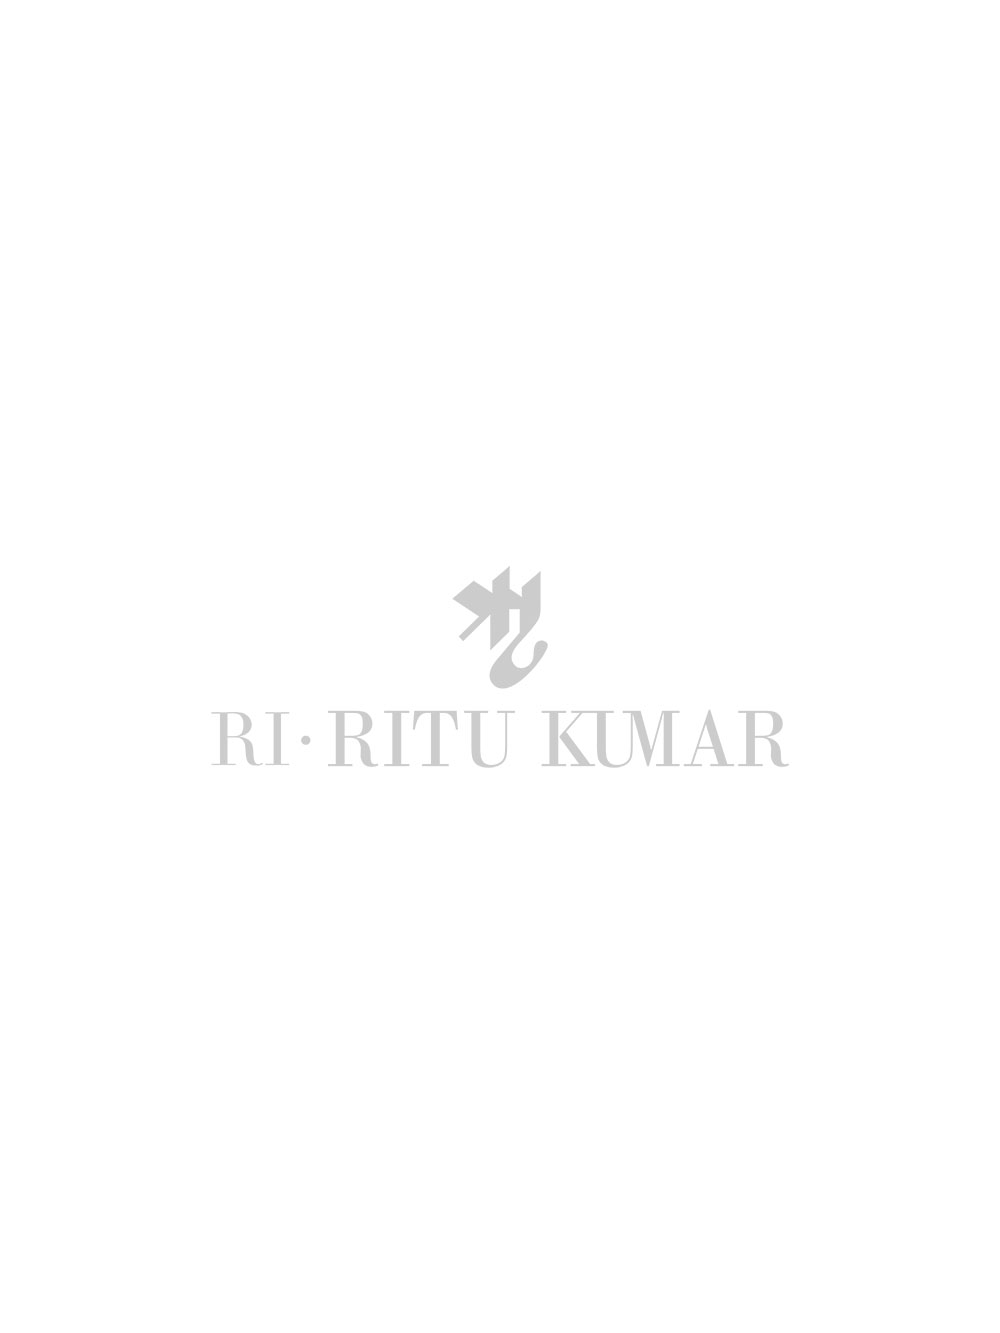 Jade & Royal Blue Embroidered Kurta With Dupatta And Churidar